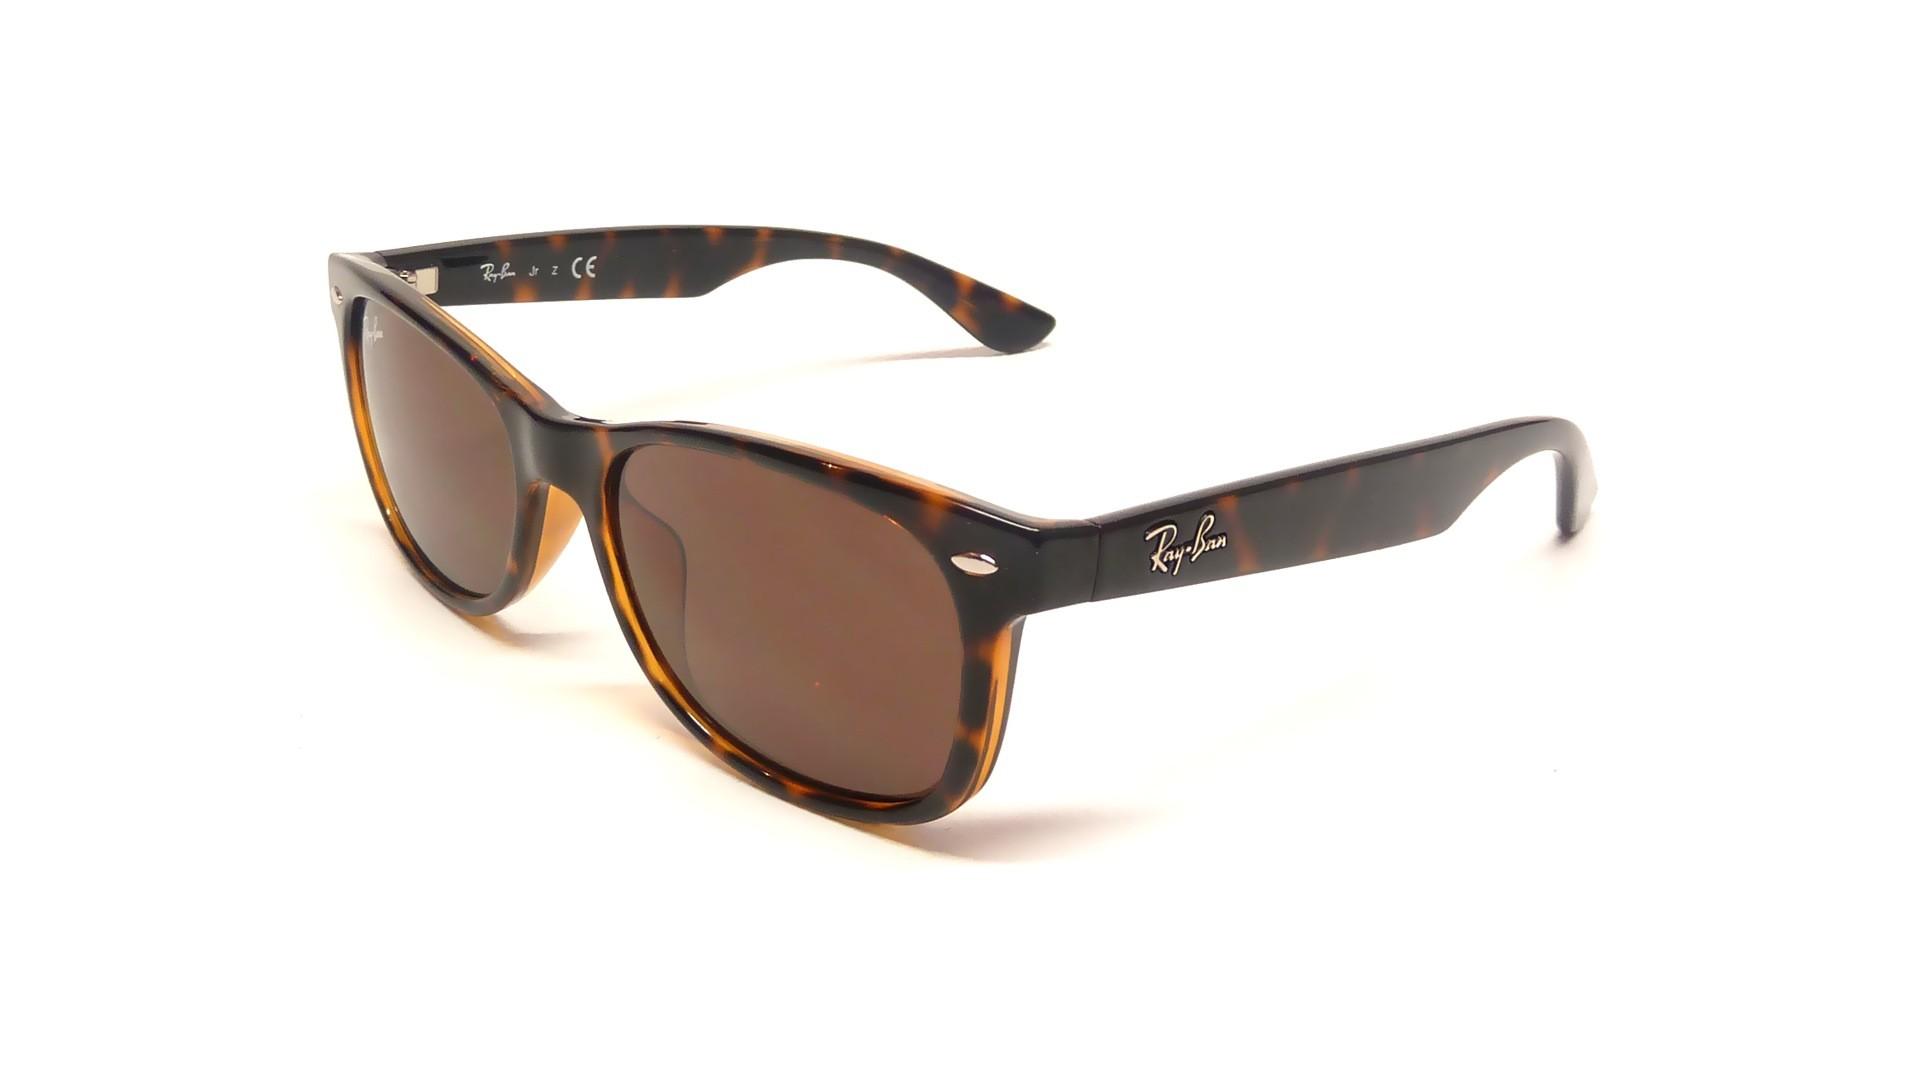 46b9fe3e8cf22 Sunglasses Ray-Ban Wayfarer Tortoise RJ9052S 152 73 47-15 Small